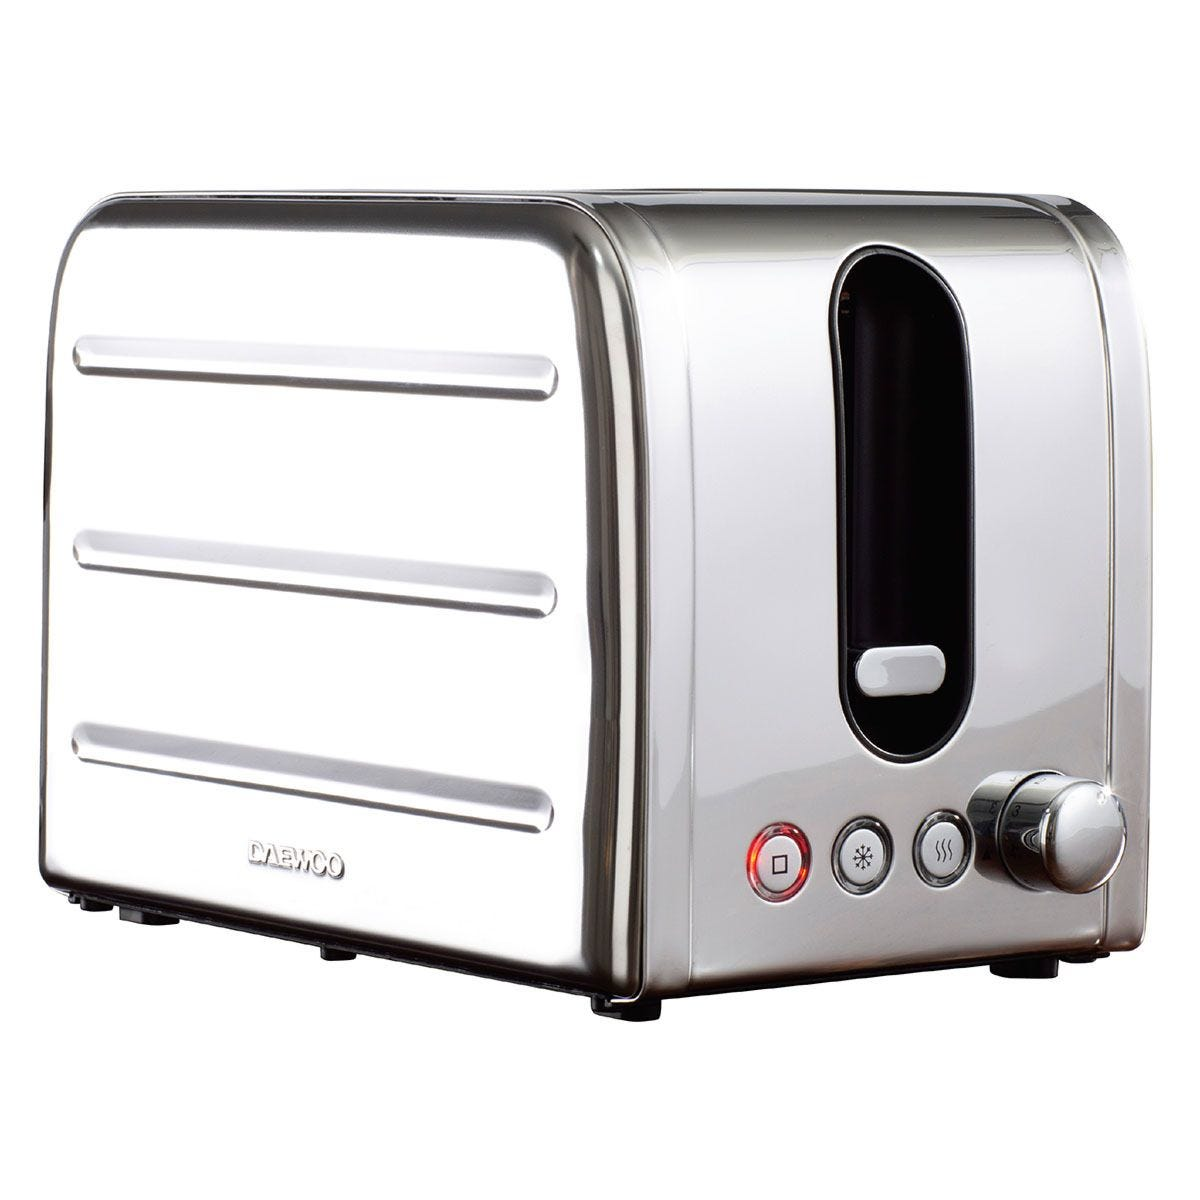 Daewoo SDA1786DS Deauville 2-Slice Toaster - Stainless Steel